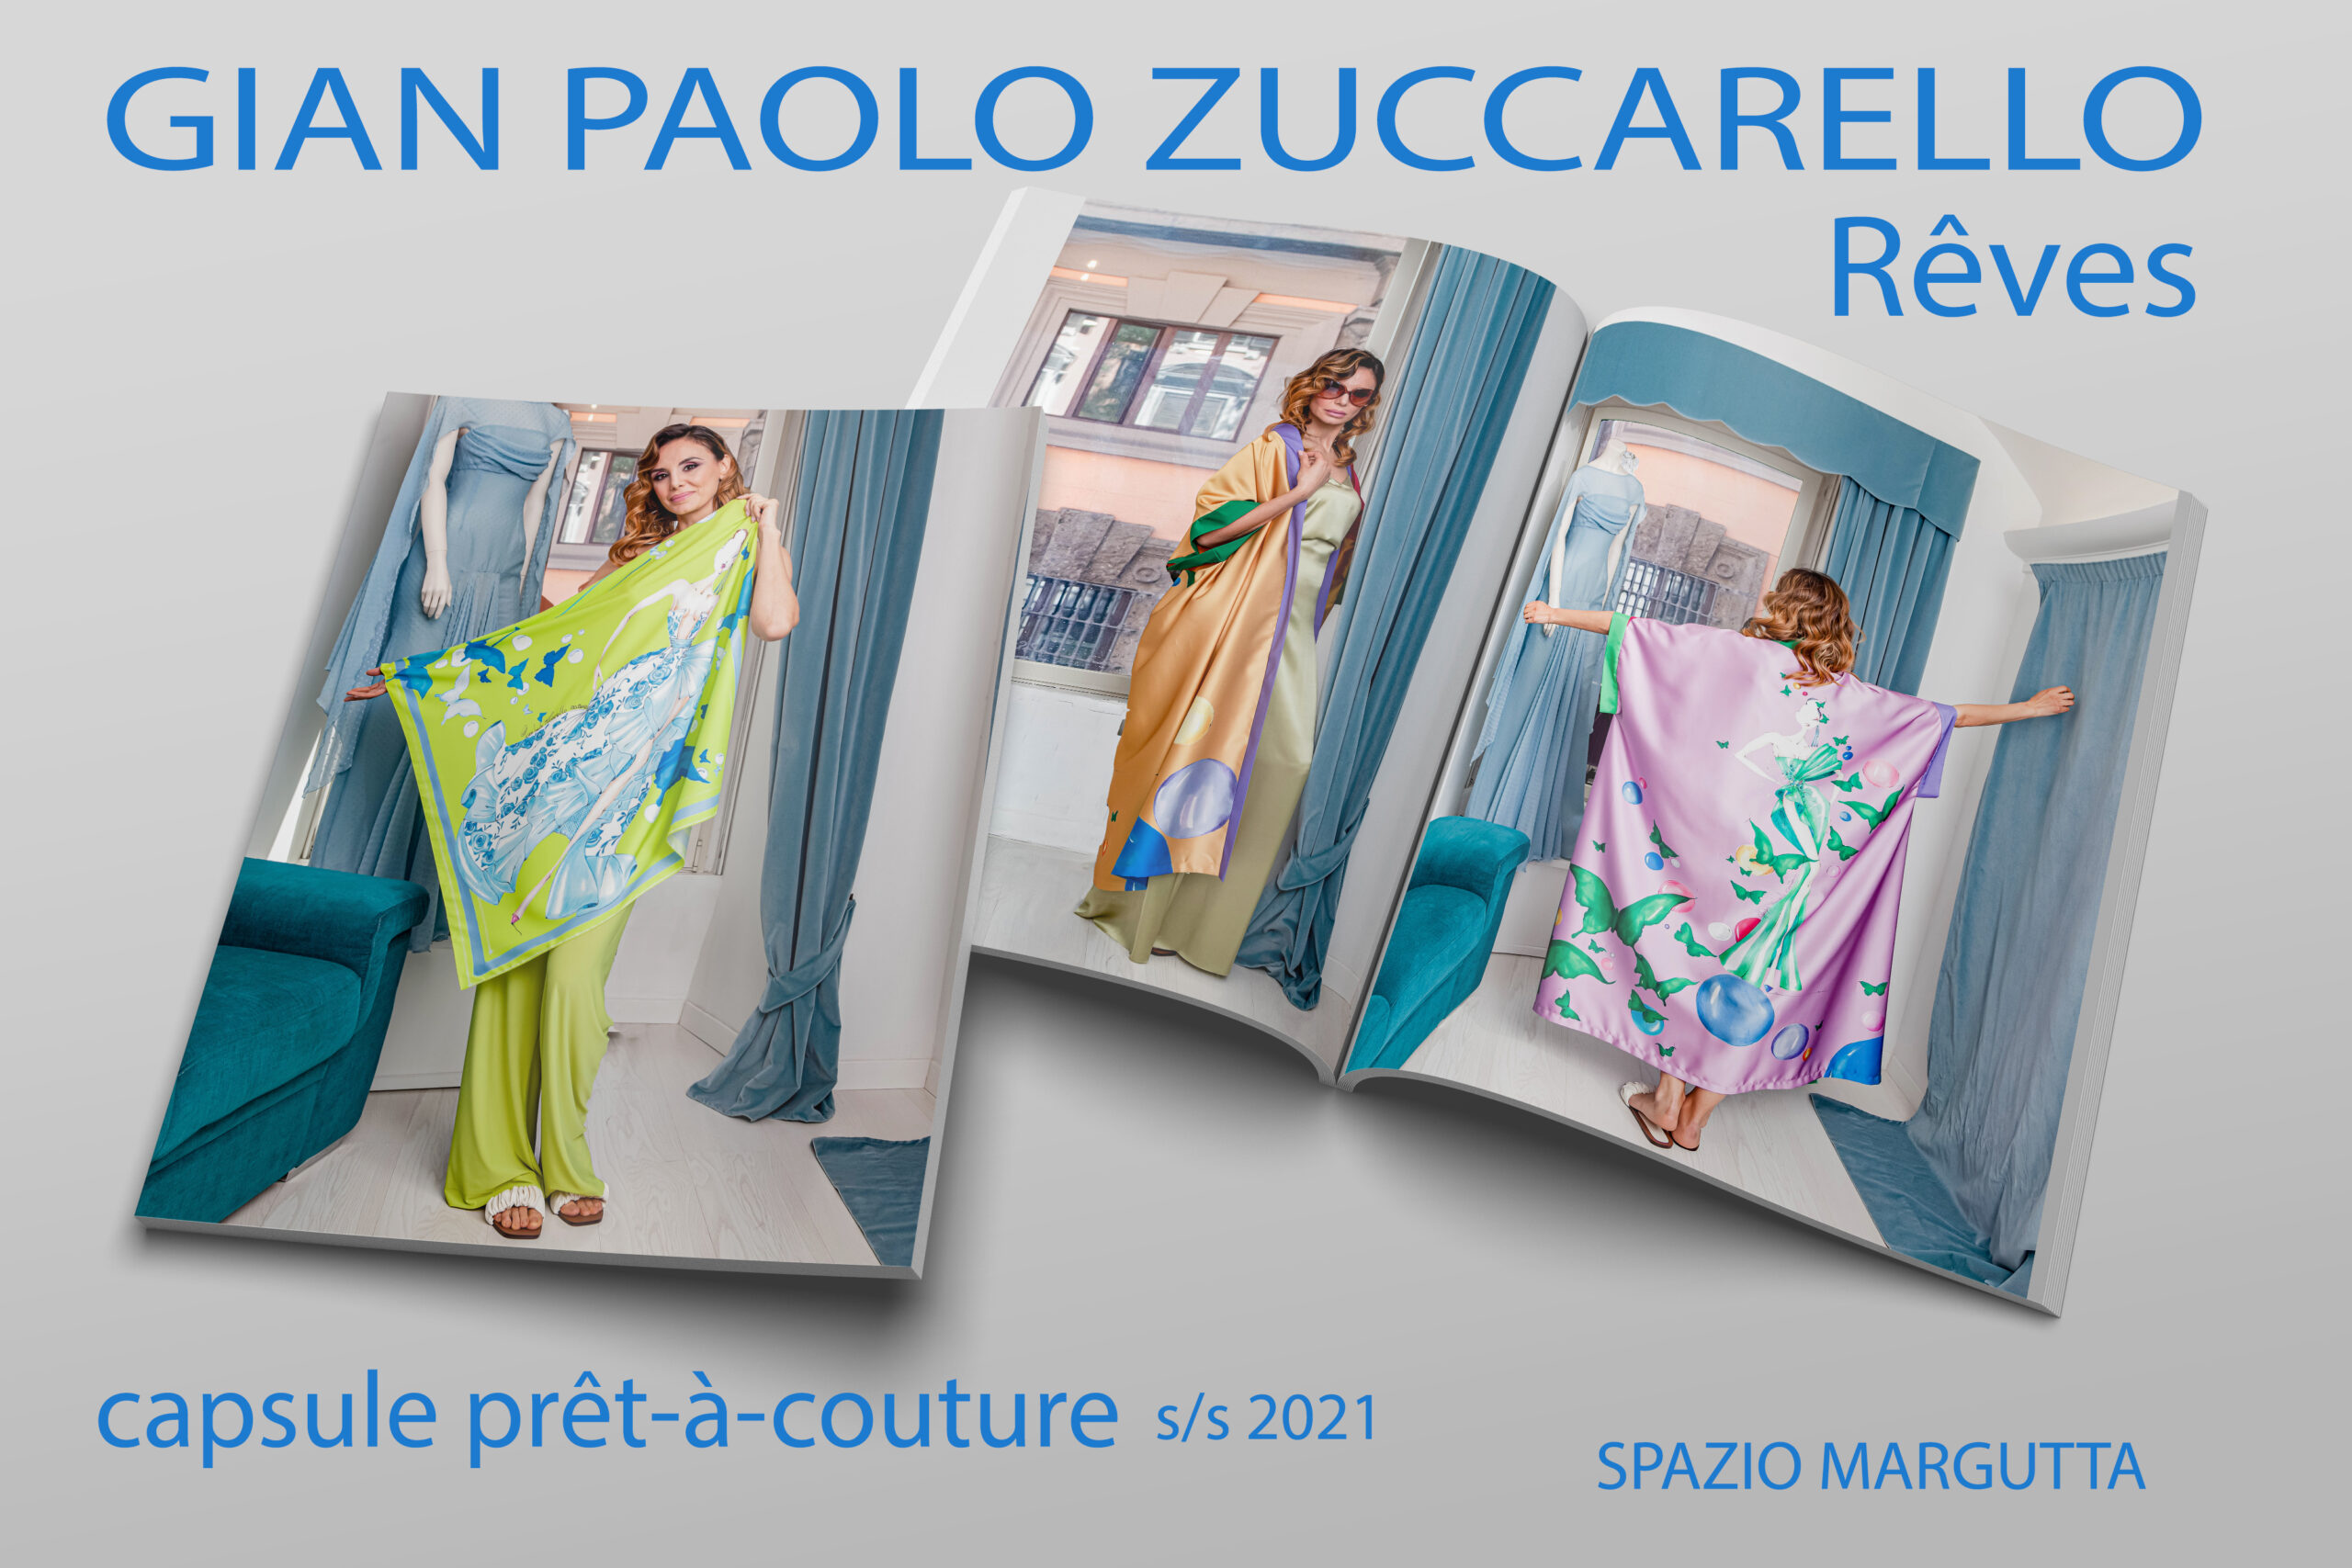 "nuova capsule prêt-à-couture di Gian Paolo Zuccarello ""Rêves"" presentata a Spazio Margutta."